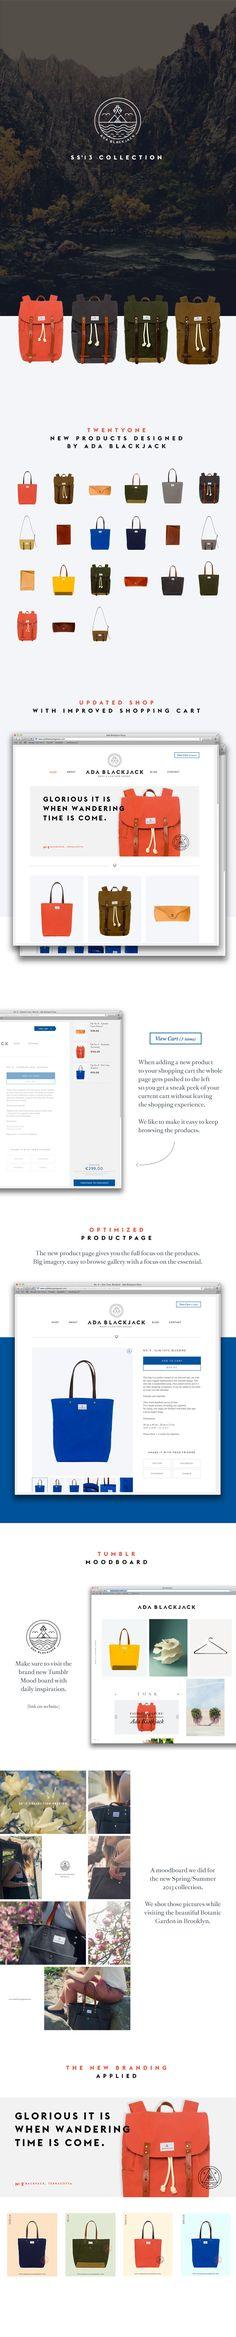 #webdesign #it #web #design #layout www.WebsiteDesign-Hamburg.de